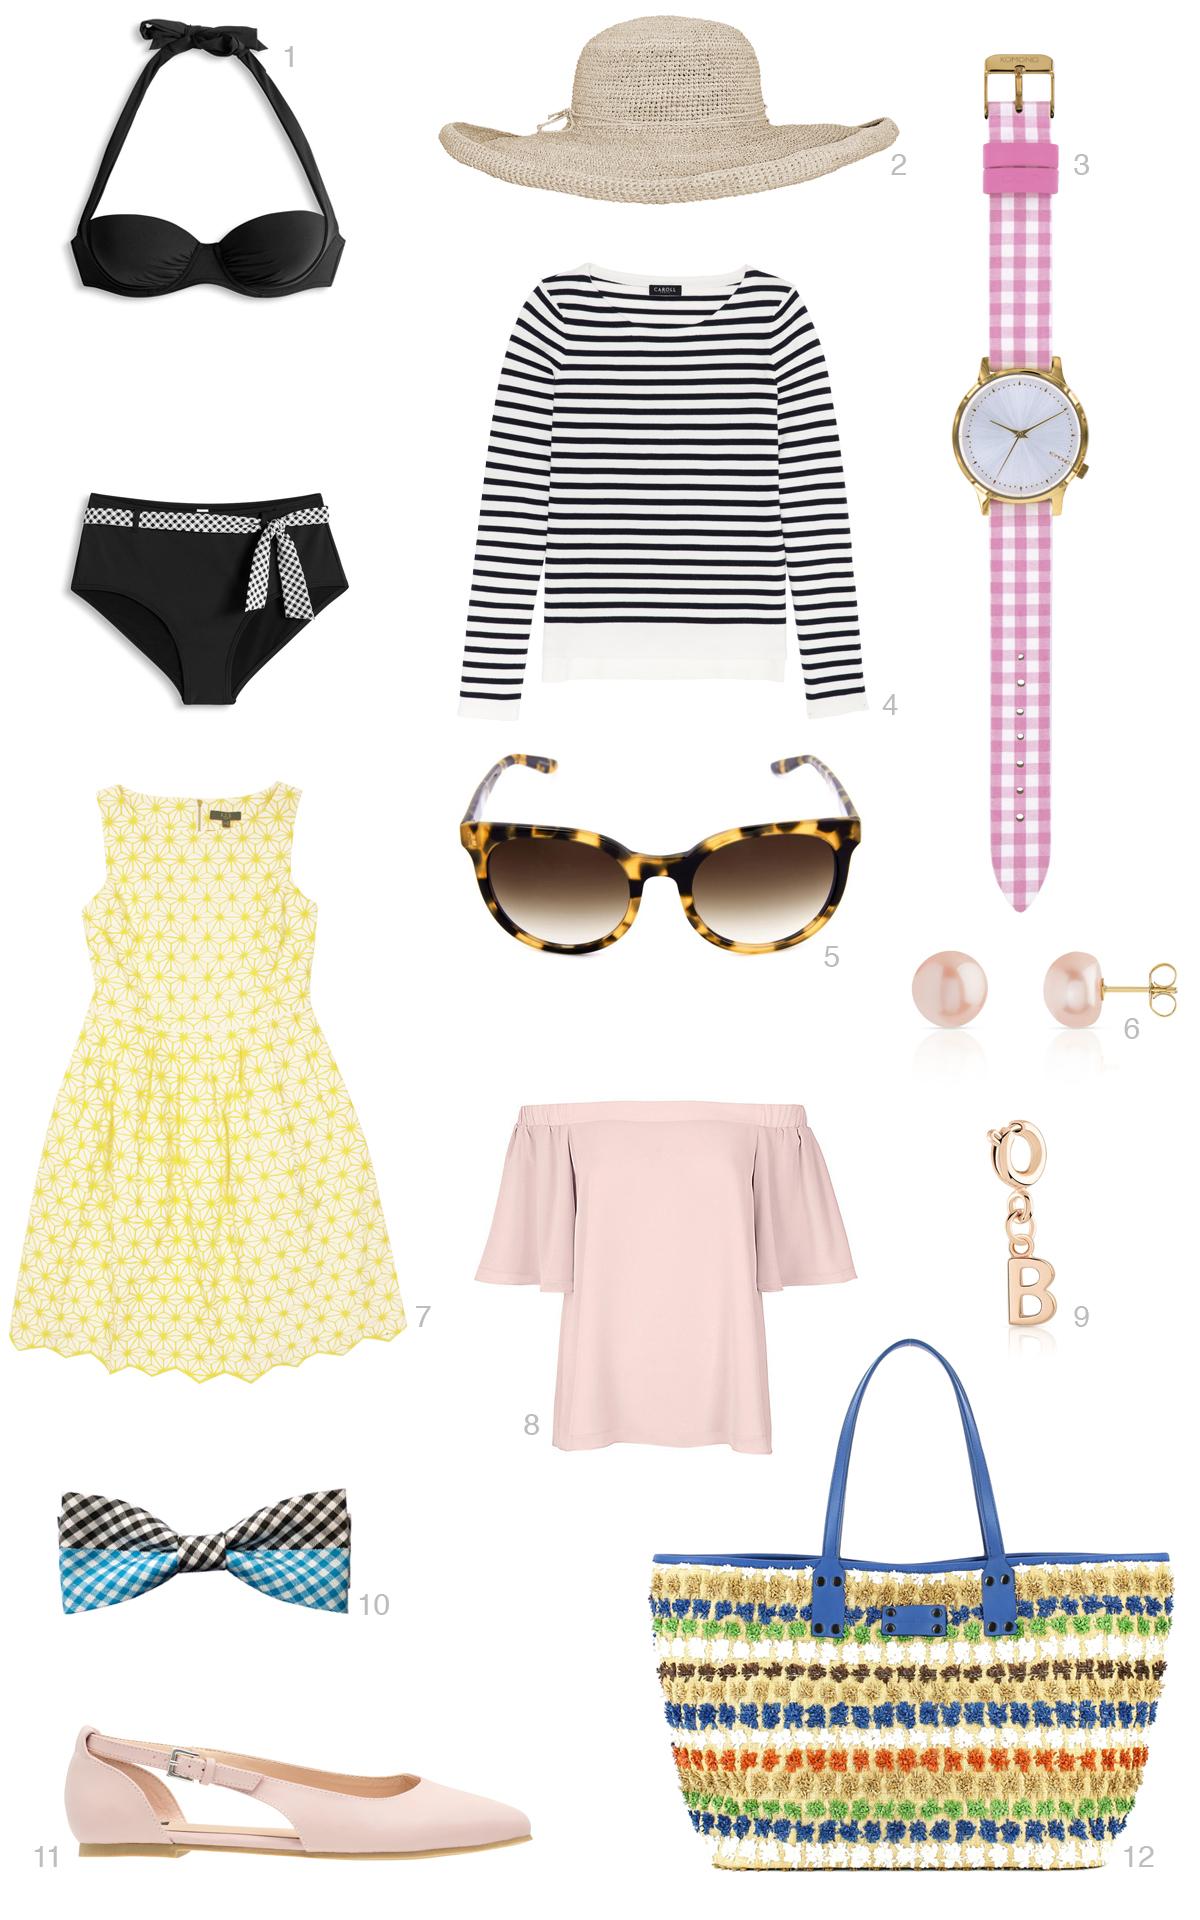 brigitte-bardot-inspired-summer-style-selection